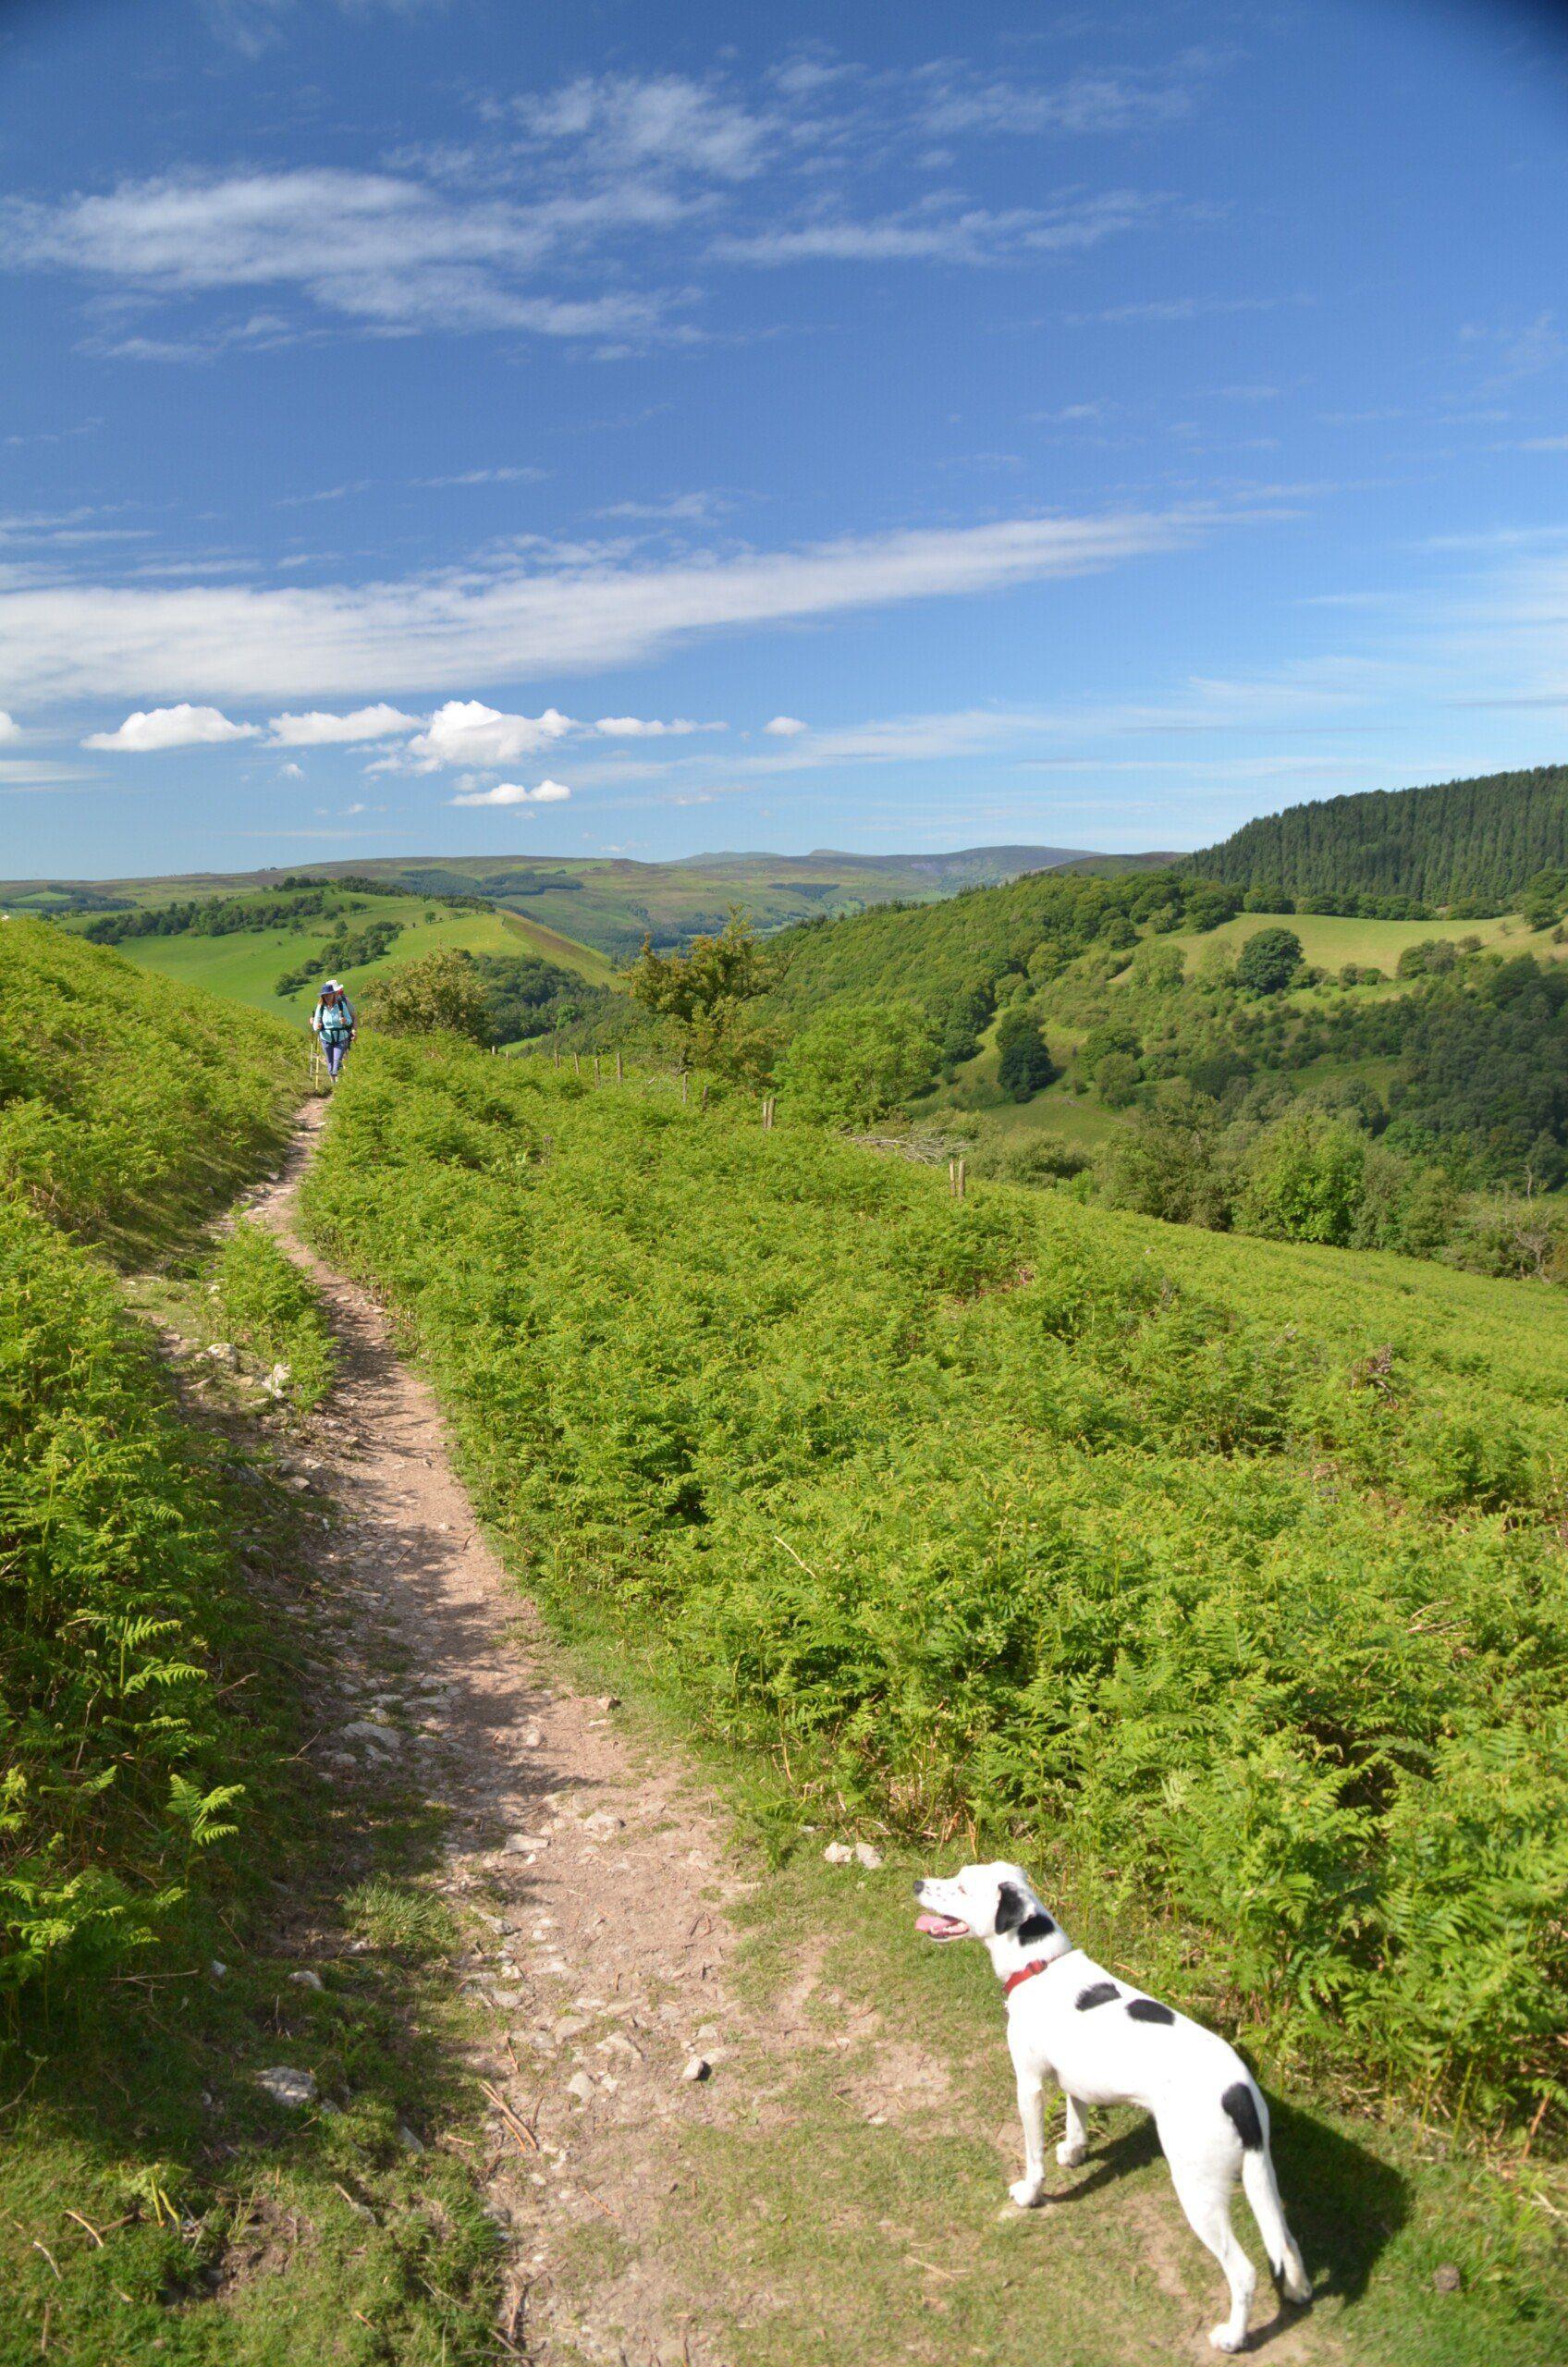 Daisy in the bracken near Eglwyseg Crags on the Offa's Dyke Path